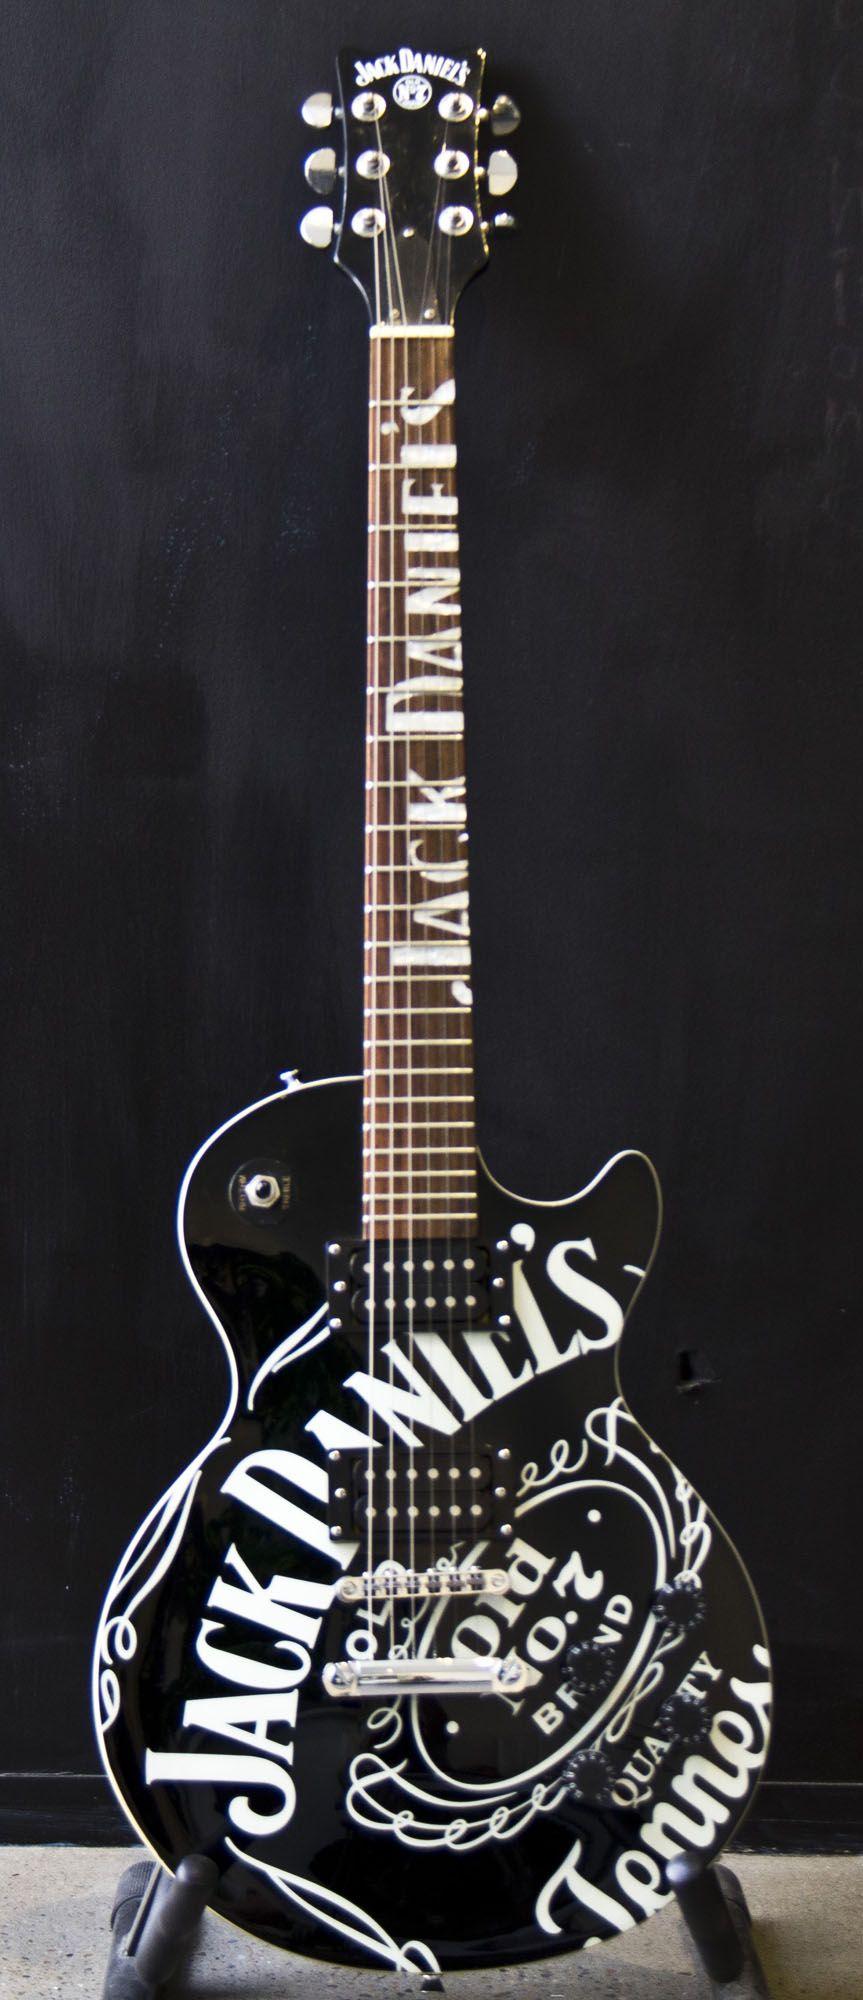 Jack Daniels guitar   Jack daniels   Jack daniels, Jack